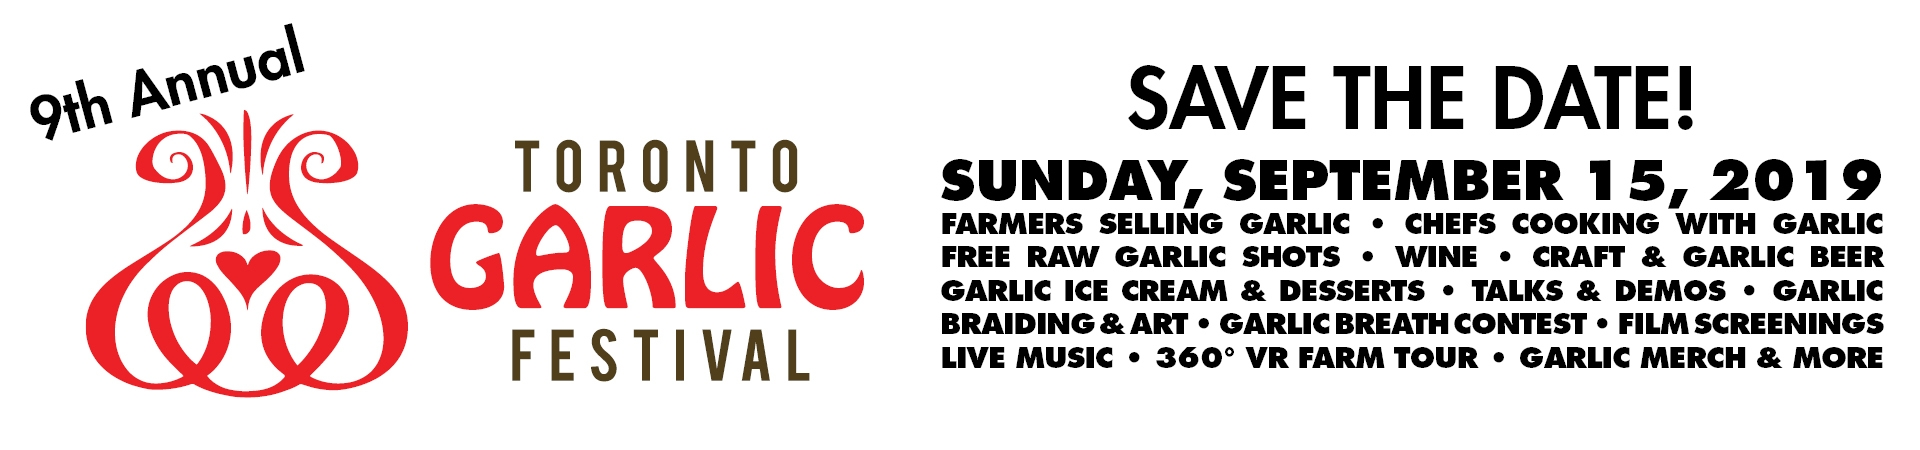 Garlic Quotes Toronto Garlic Festival